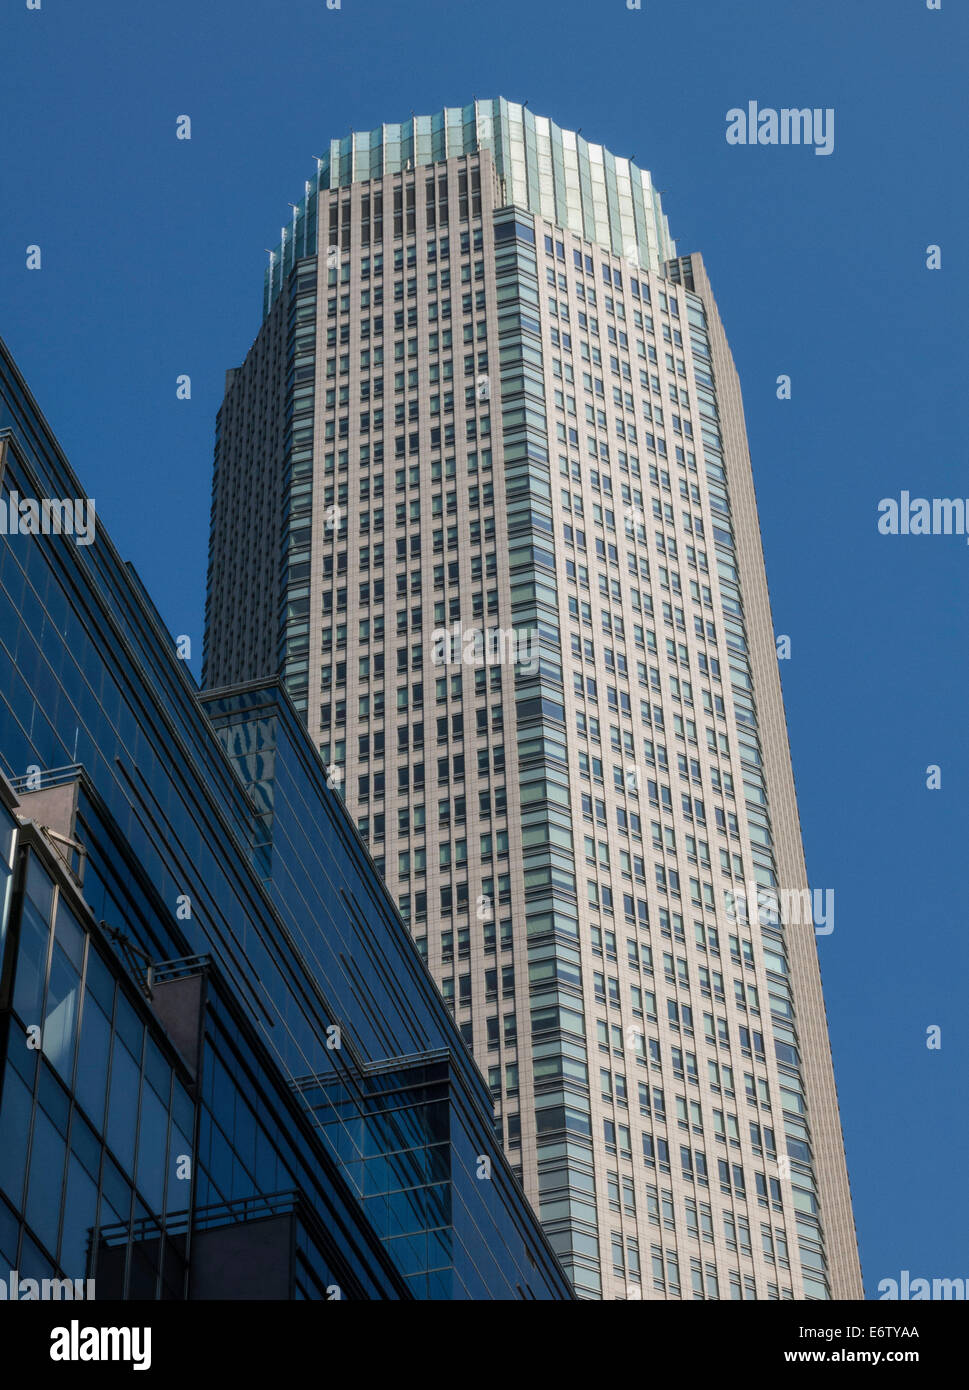 Midtown Skyscraper 383 Madison Avenue New York Nyc Usa Stock Photo Alamy